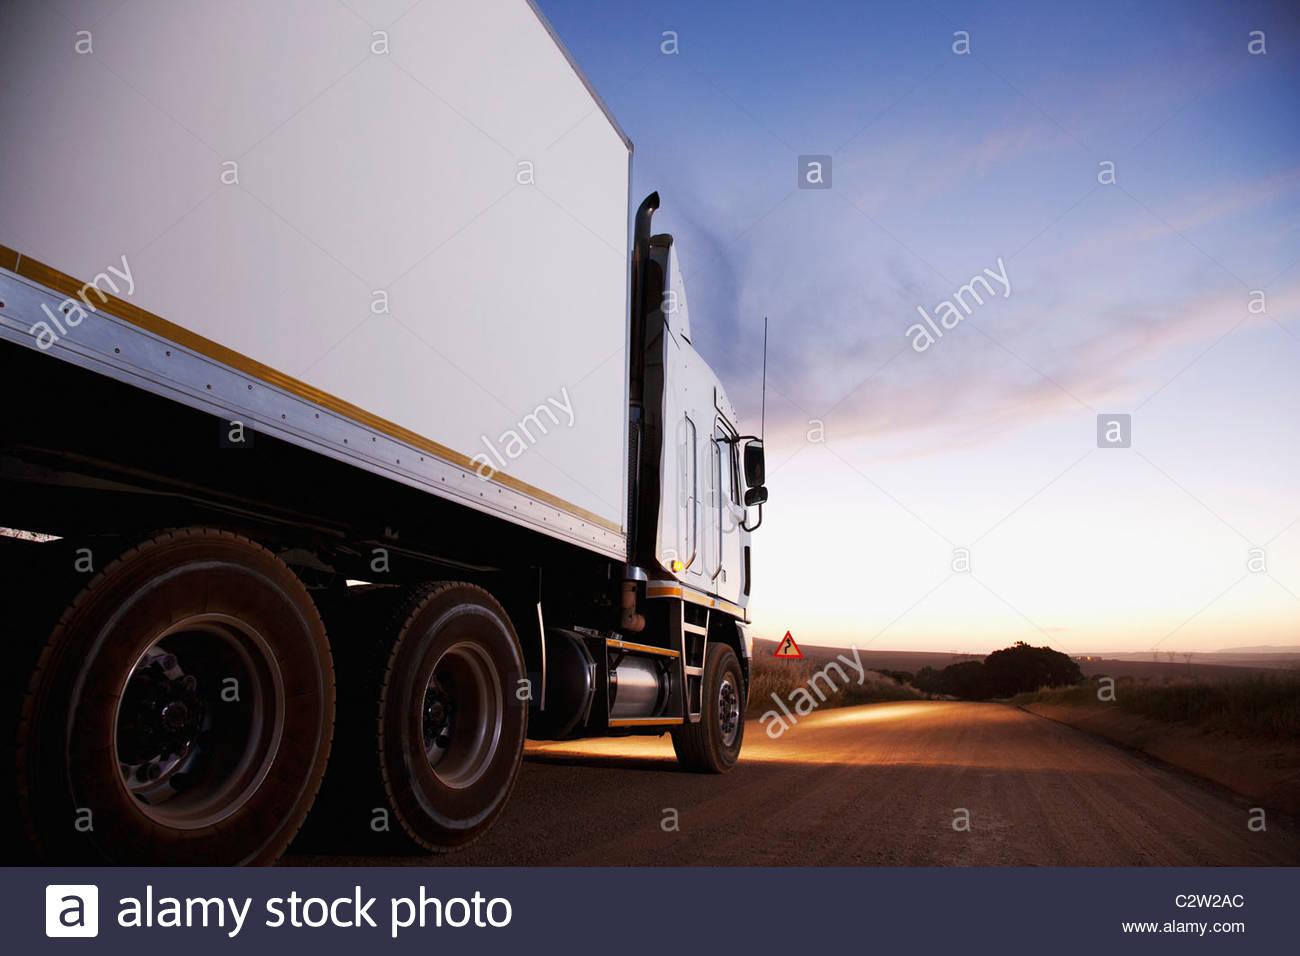 Semi-truck driving on dirt road - Stock Image